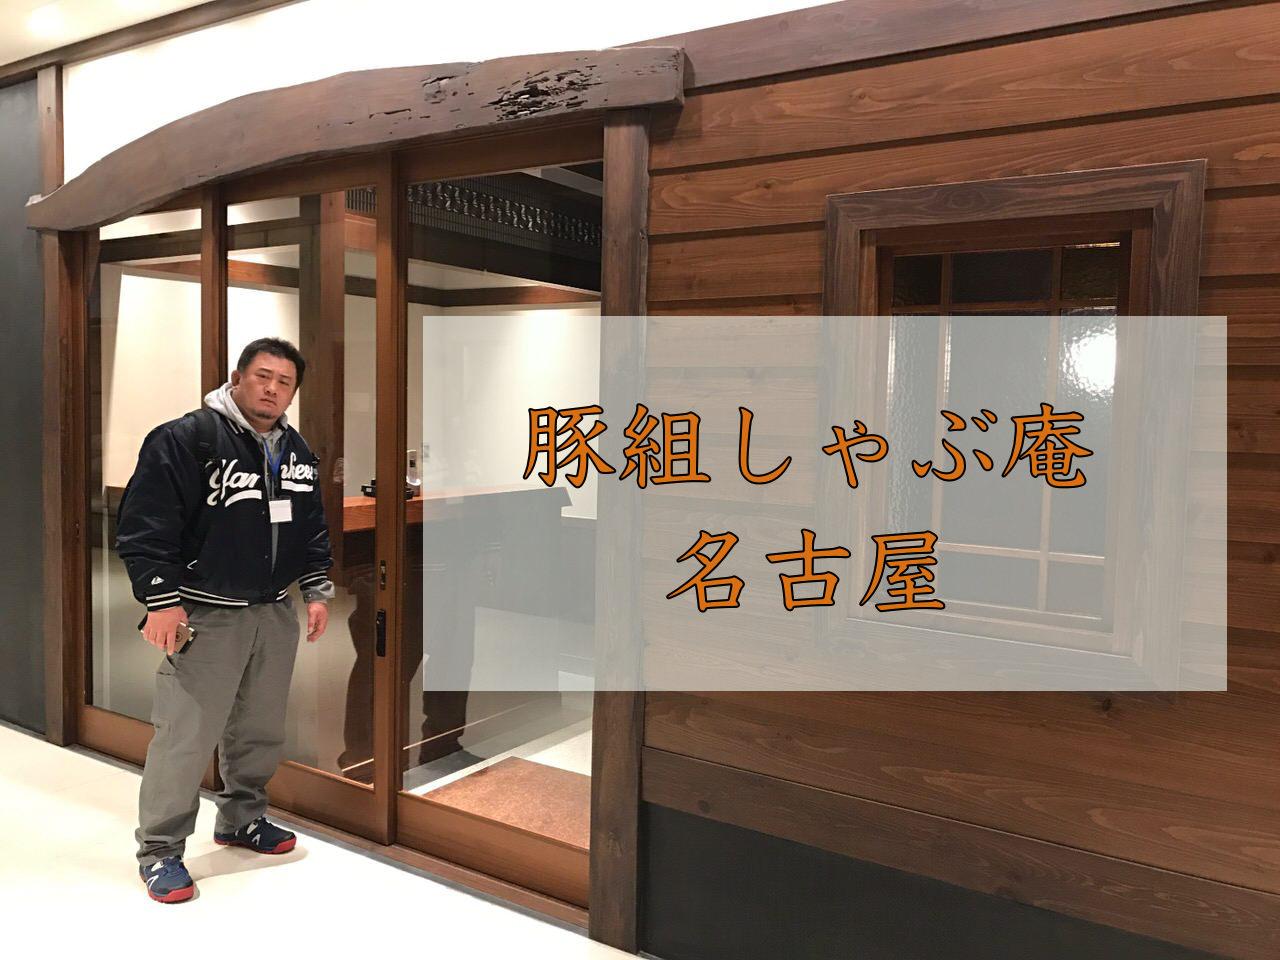 Butagumi nagoya 8175t